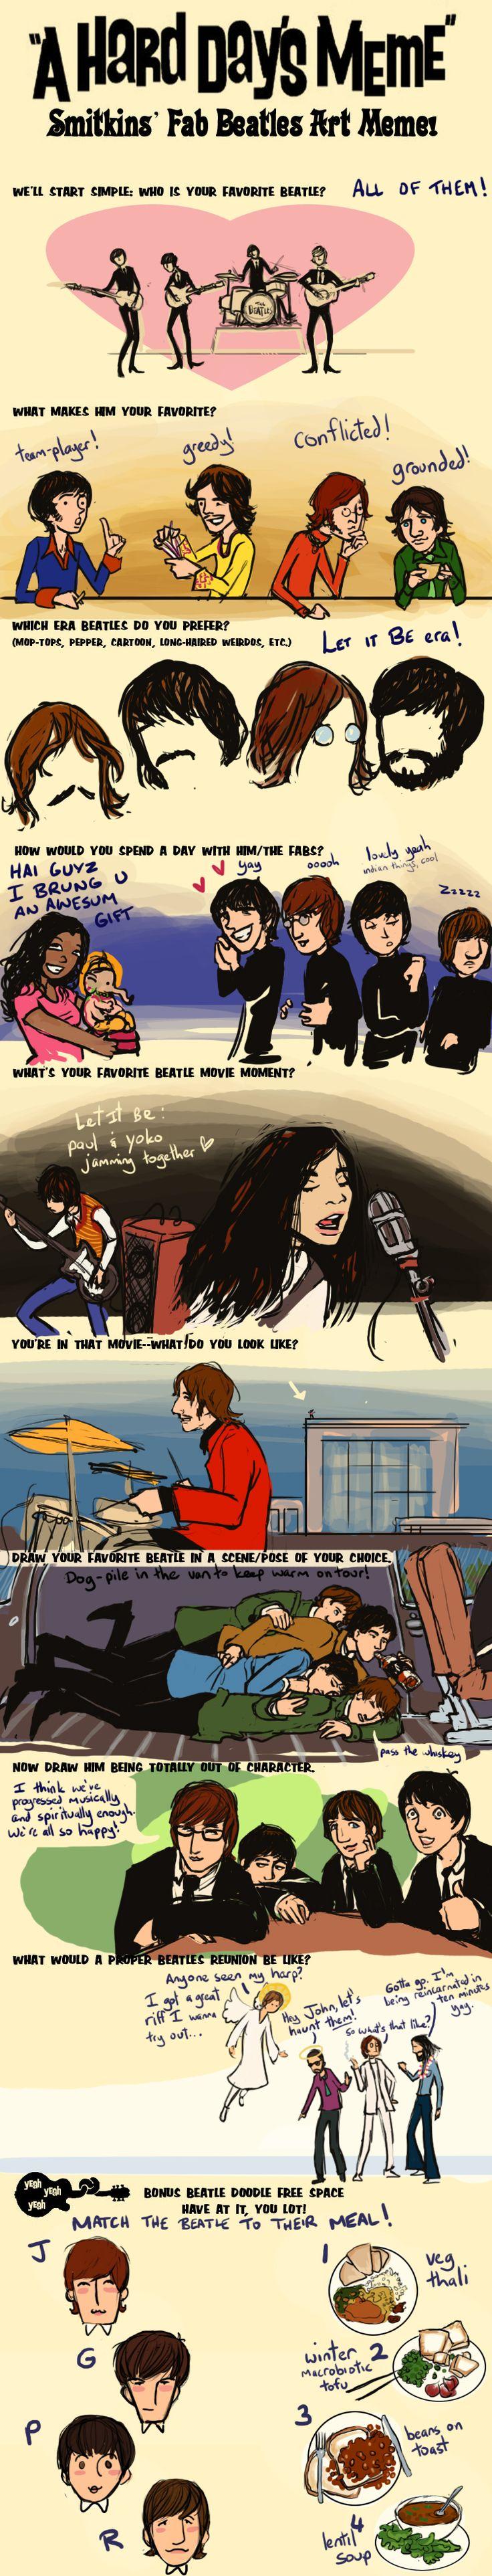 Beatles Meme by lorainesammy on deviantART